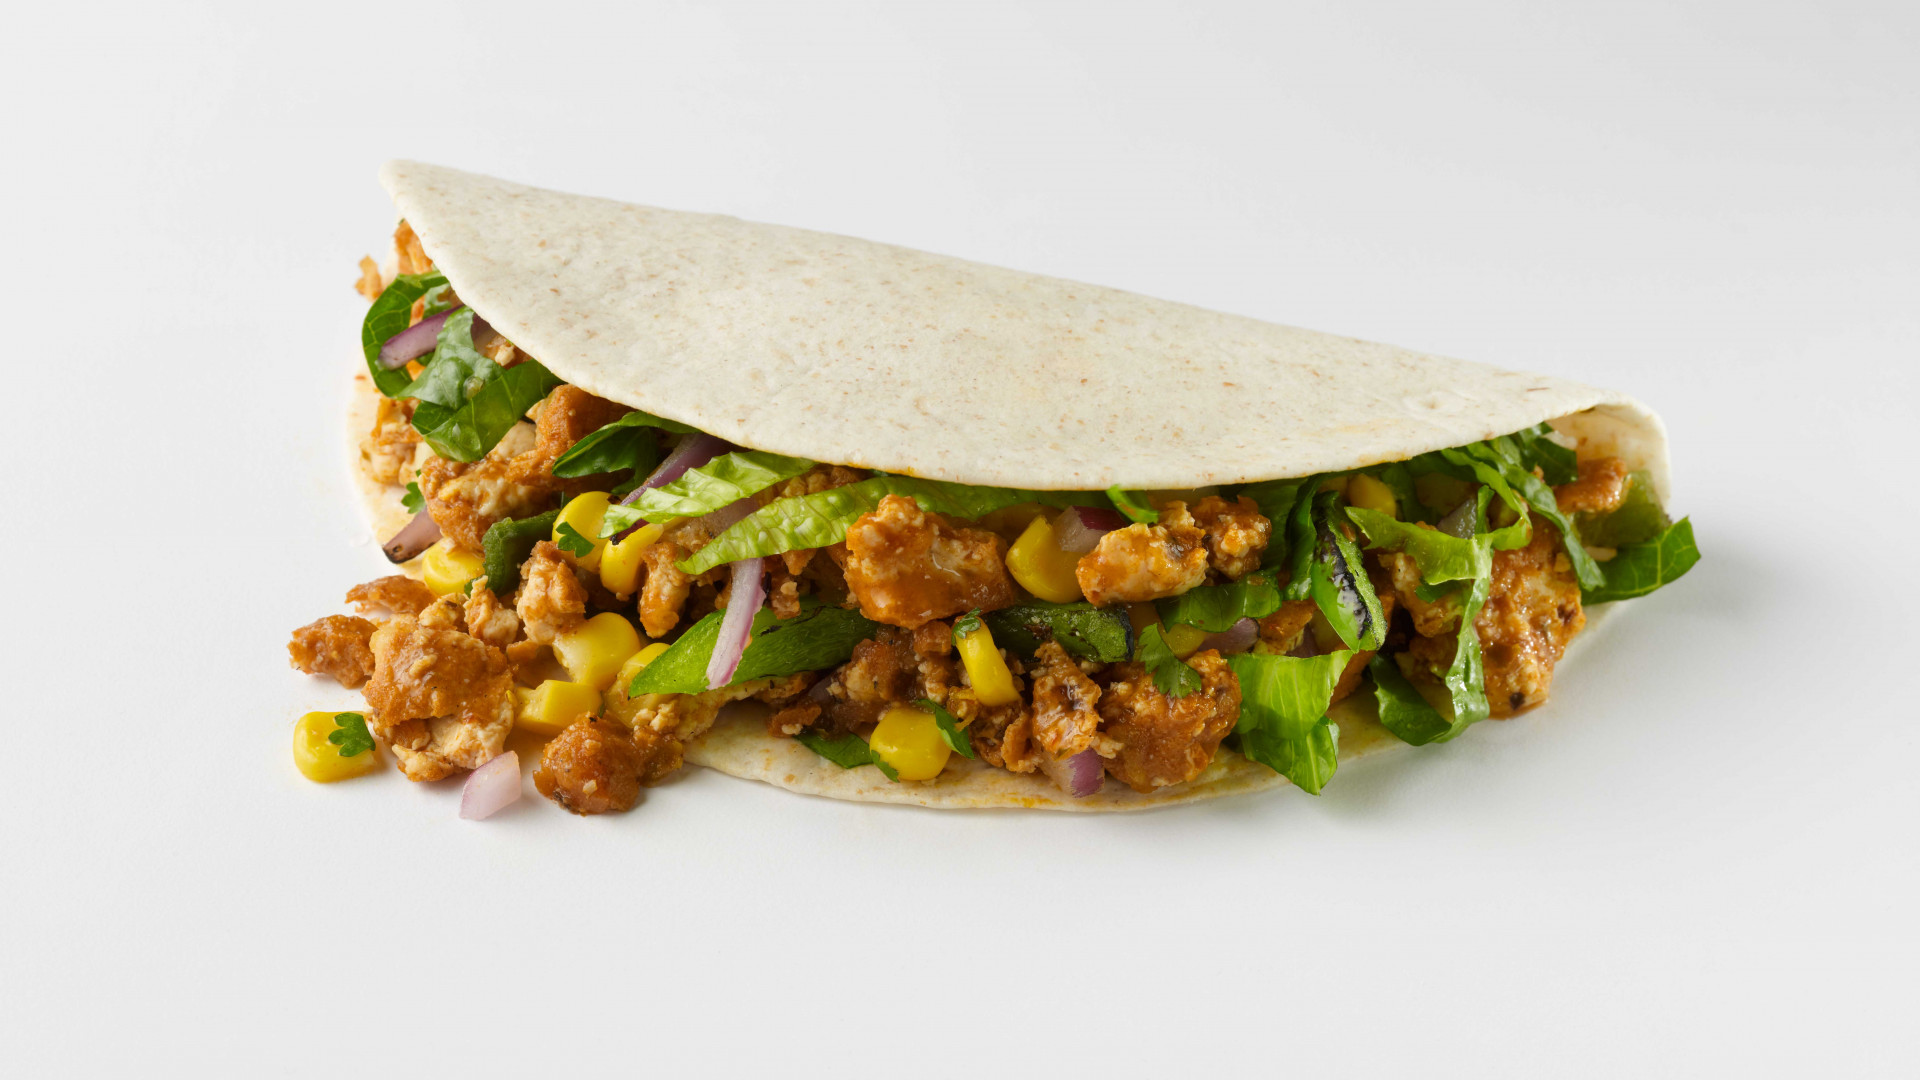 Vegan Boost taco at Chipotle